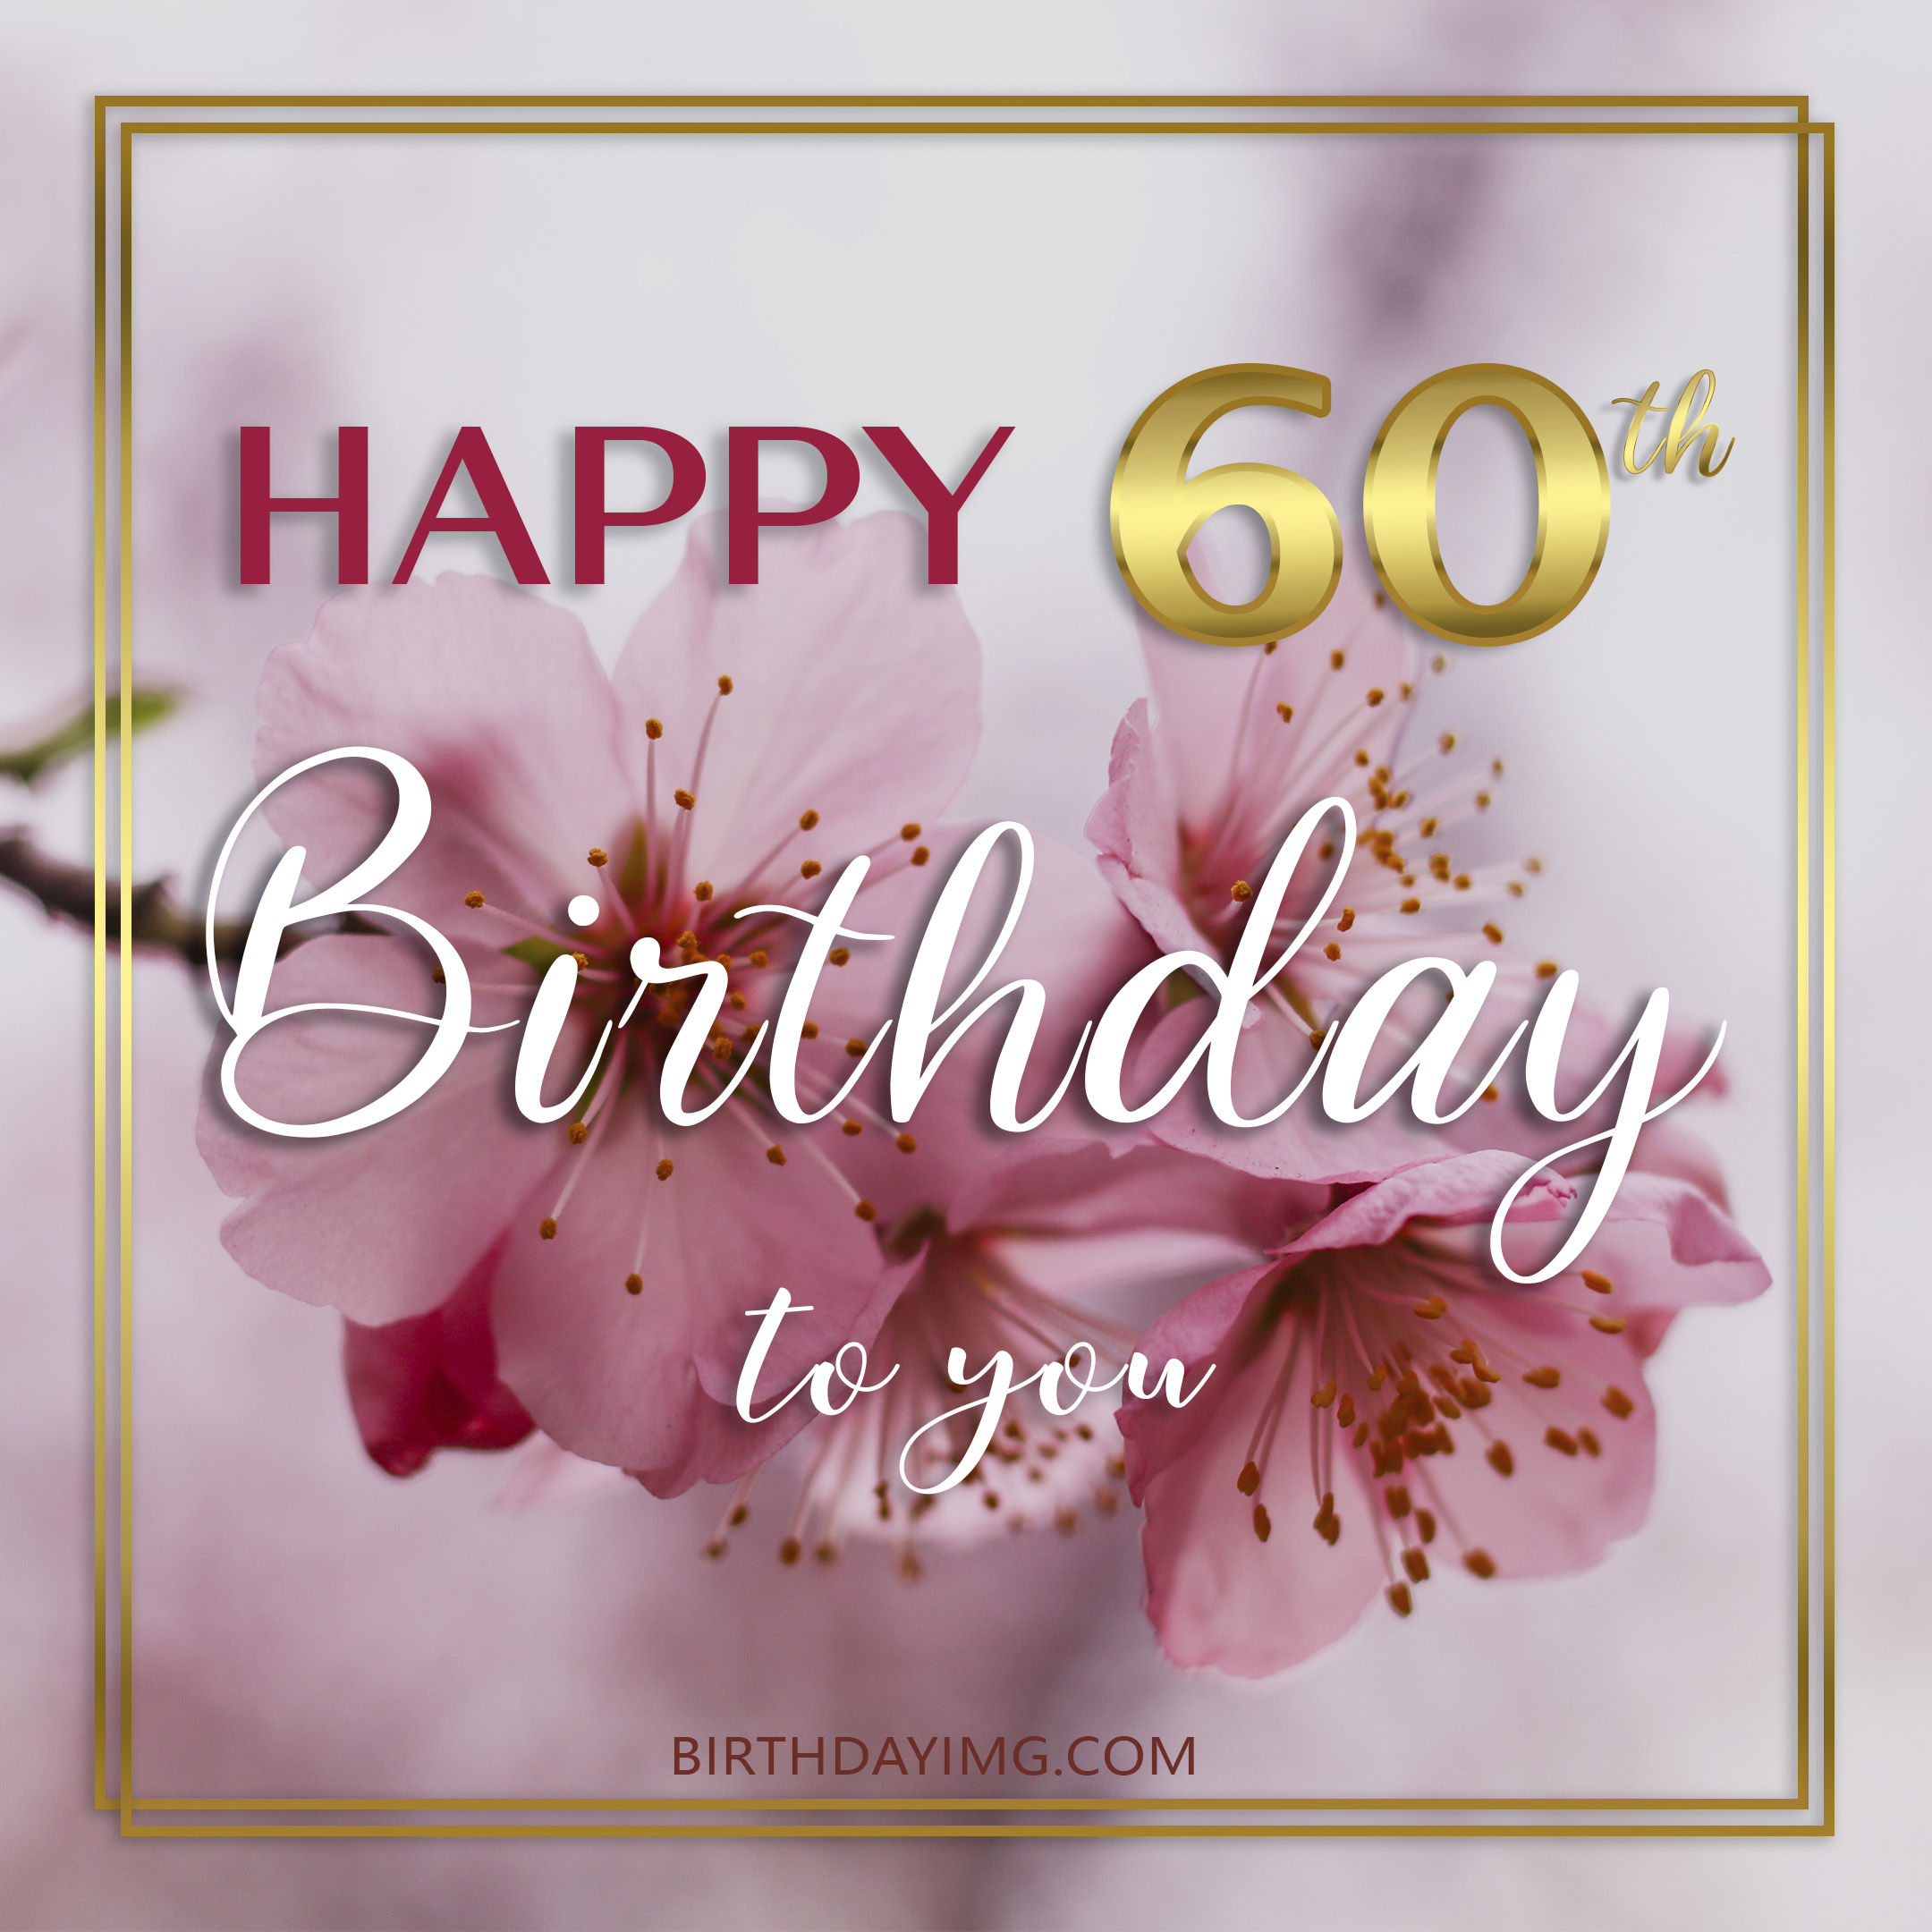 Free 60th Years Happy Birthday Image With Pink Flowers - birthdayimg.com